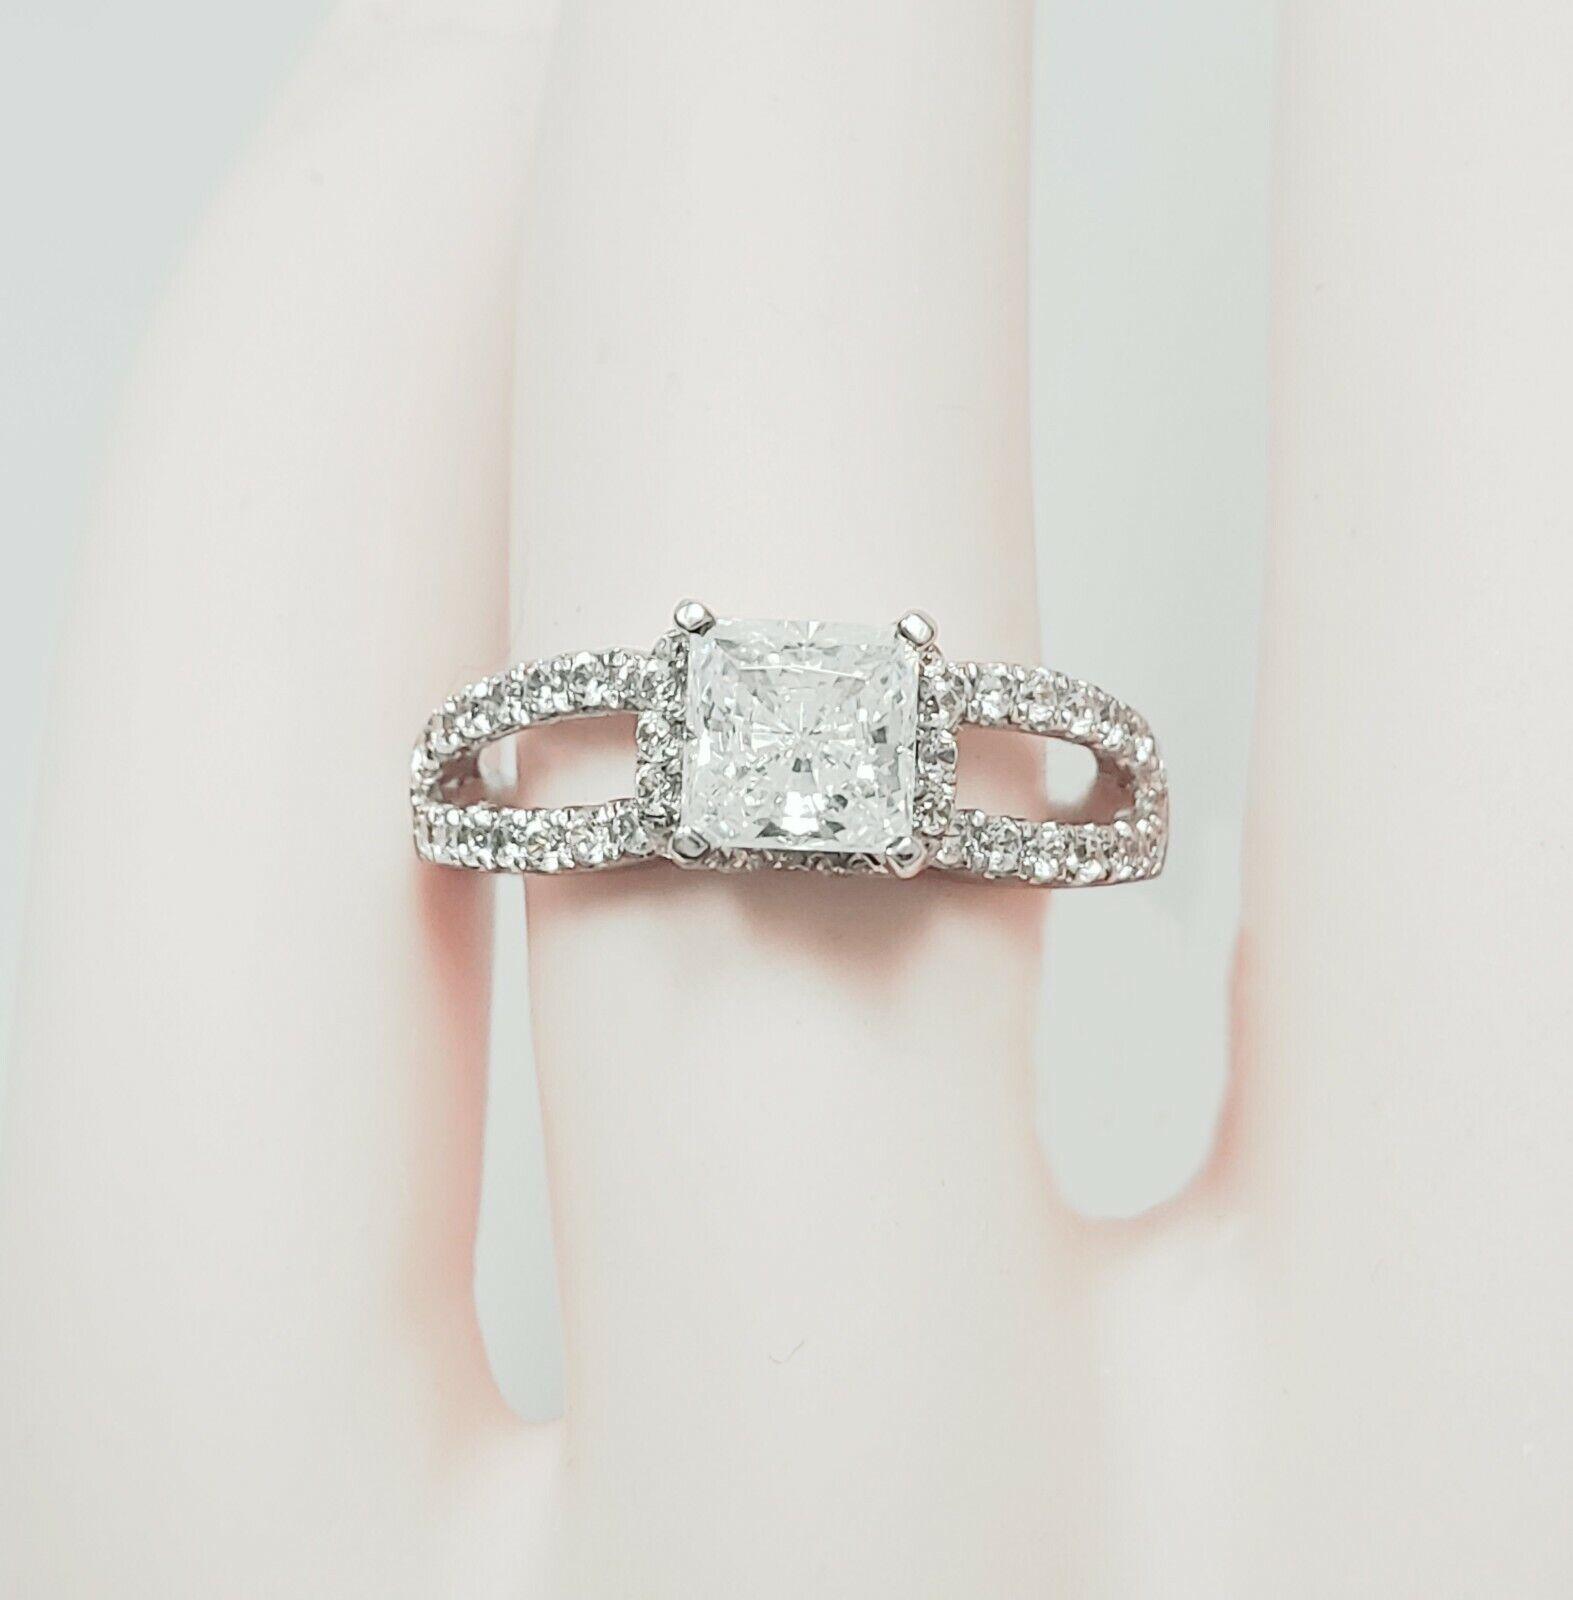 GIA Certified Diamond Engagement Ring 2.22 carat Cushion Shape 14K Gold  1